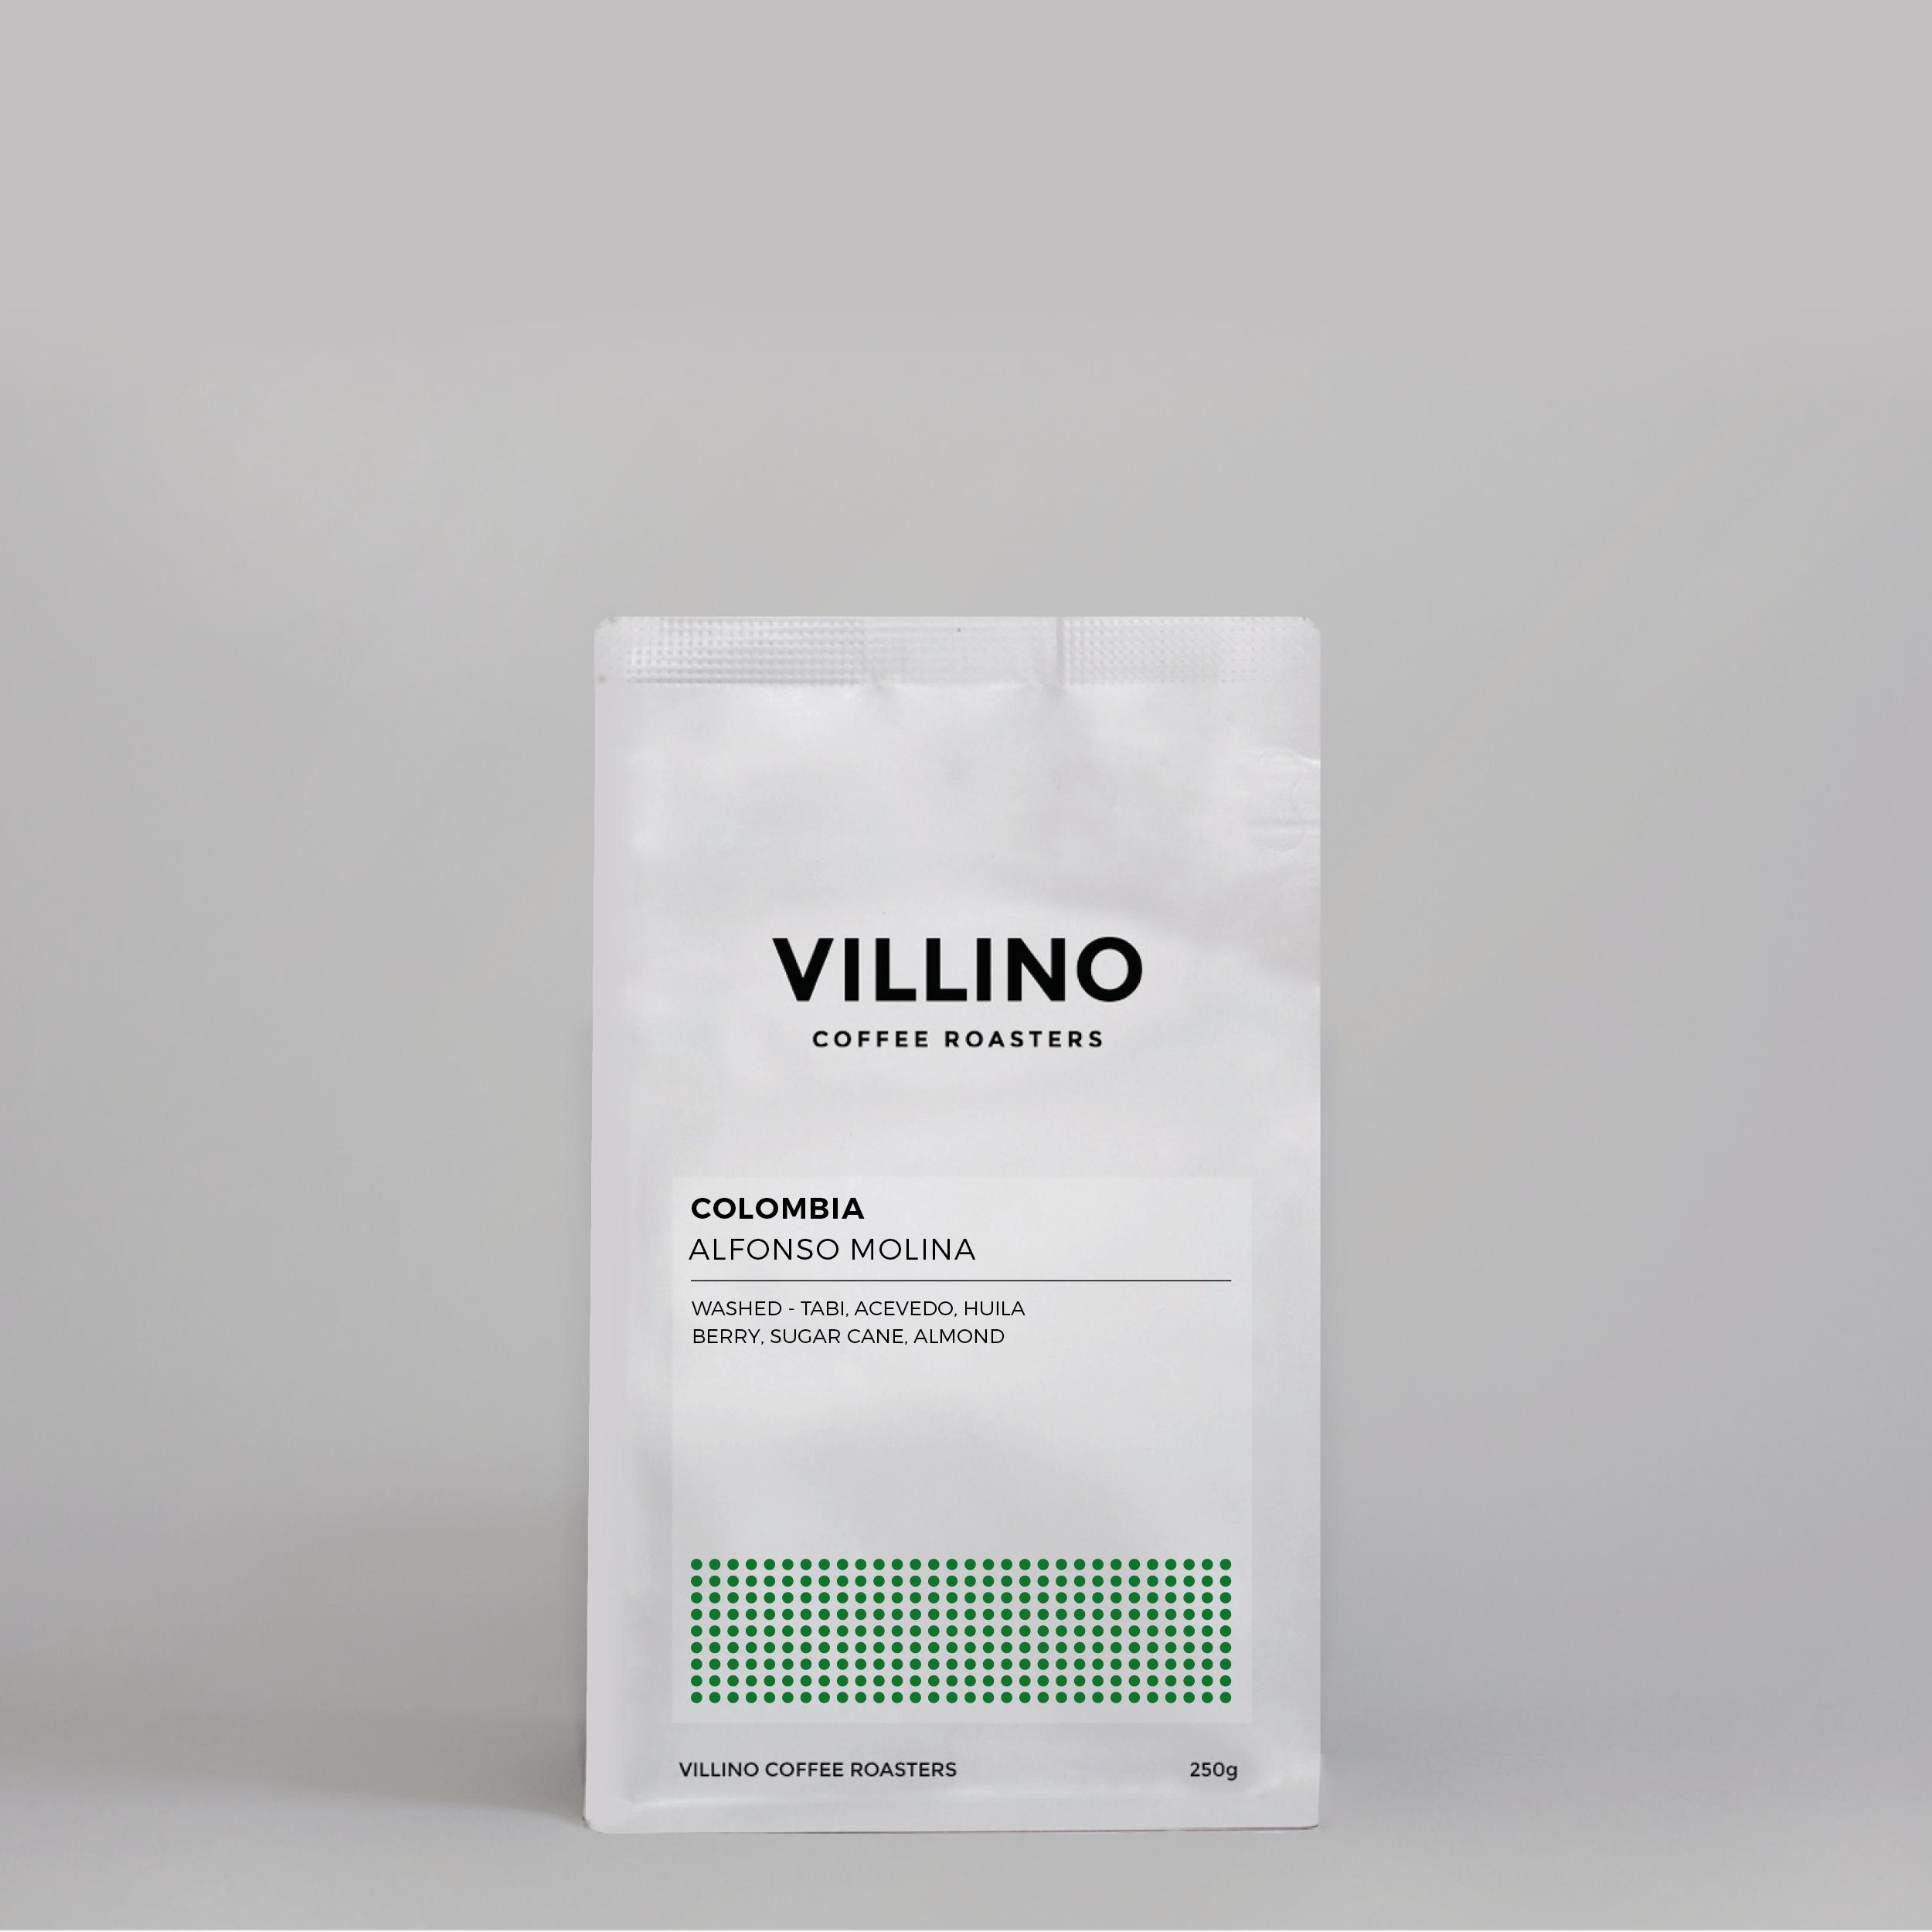 Villino_Retail Bag Templates_600x600px_Alfonso Molina.png